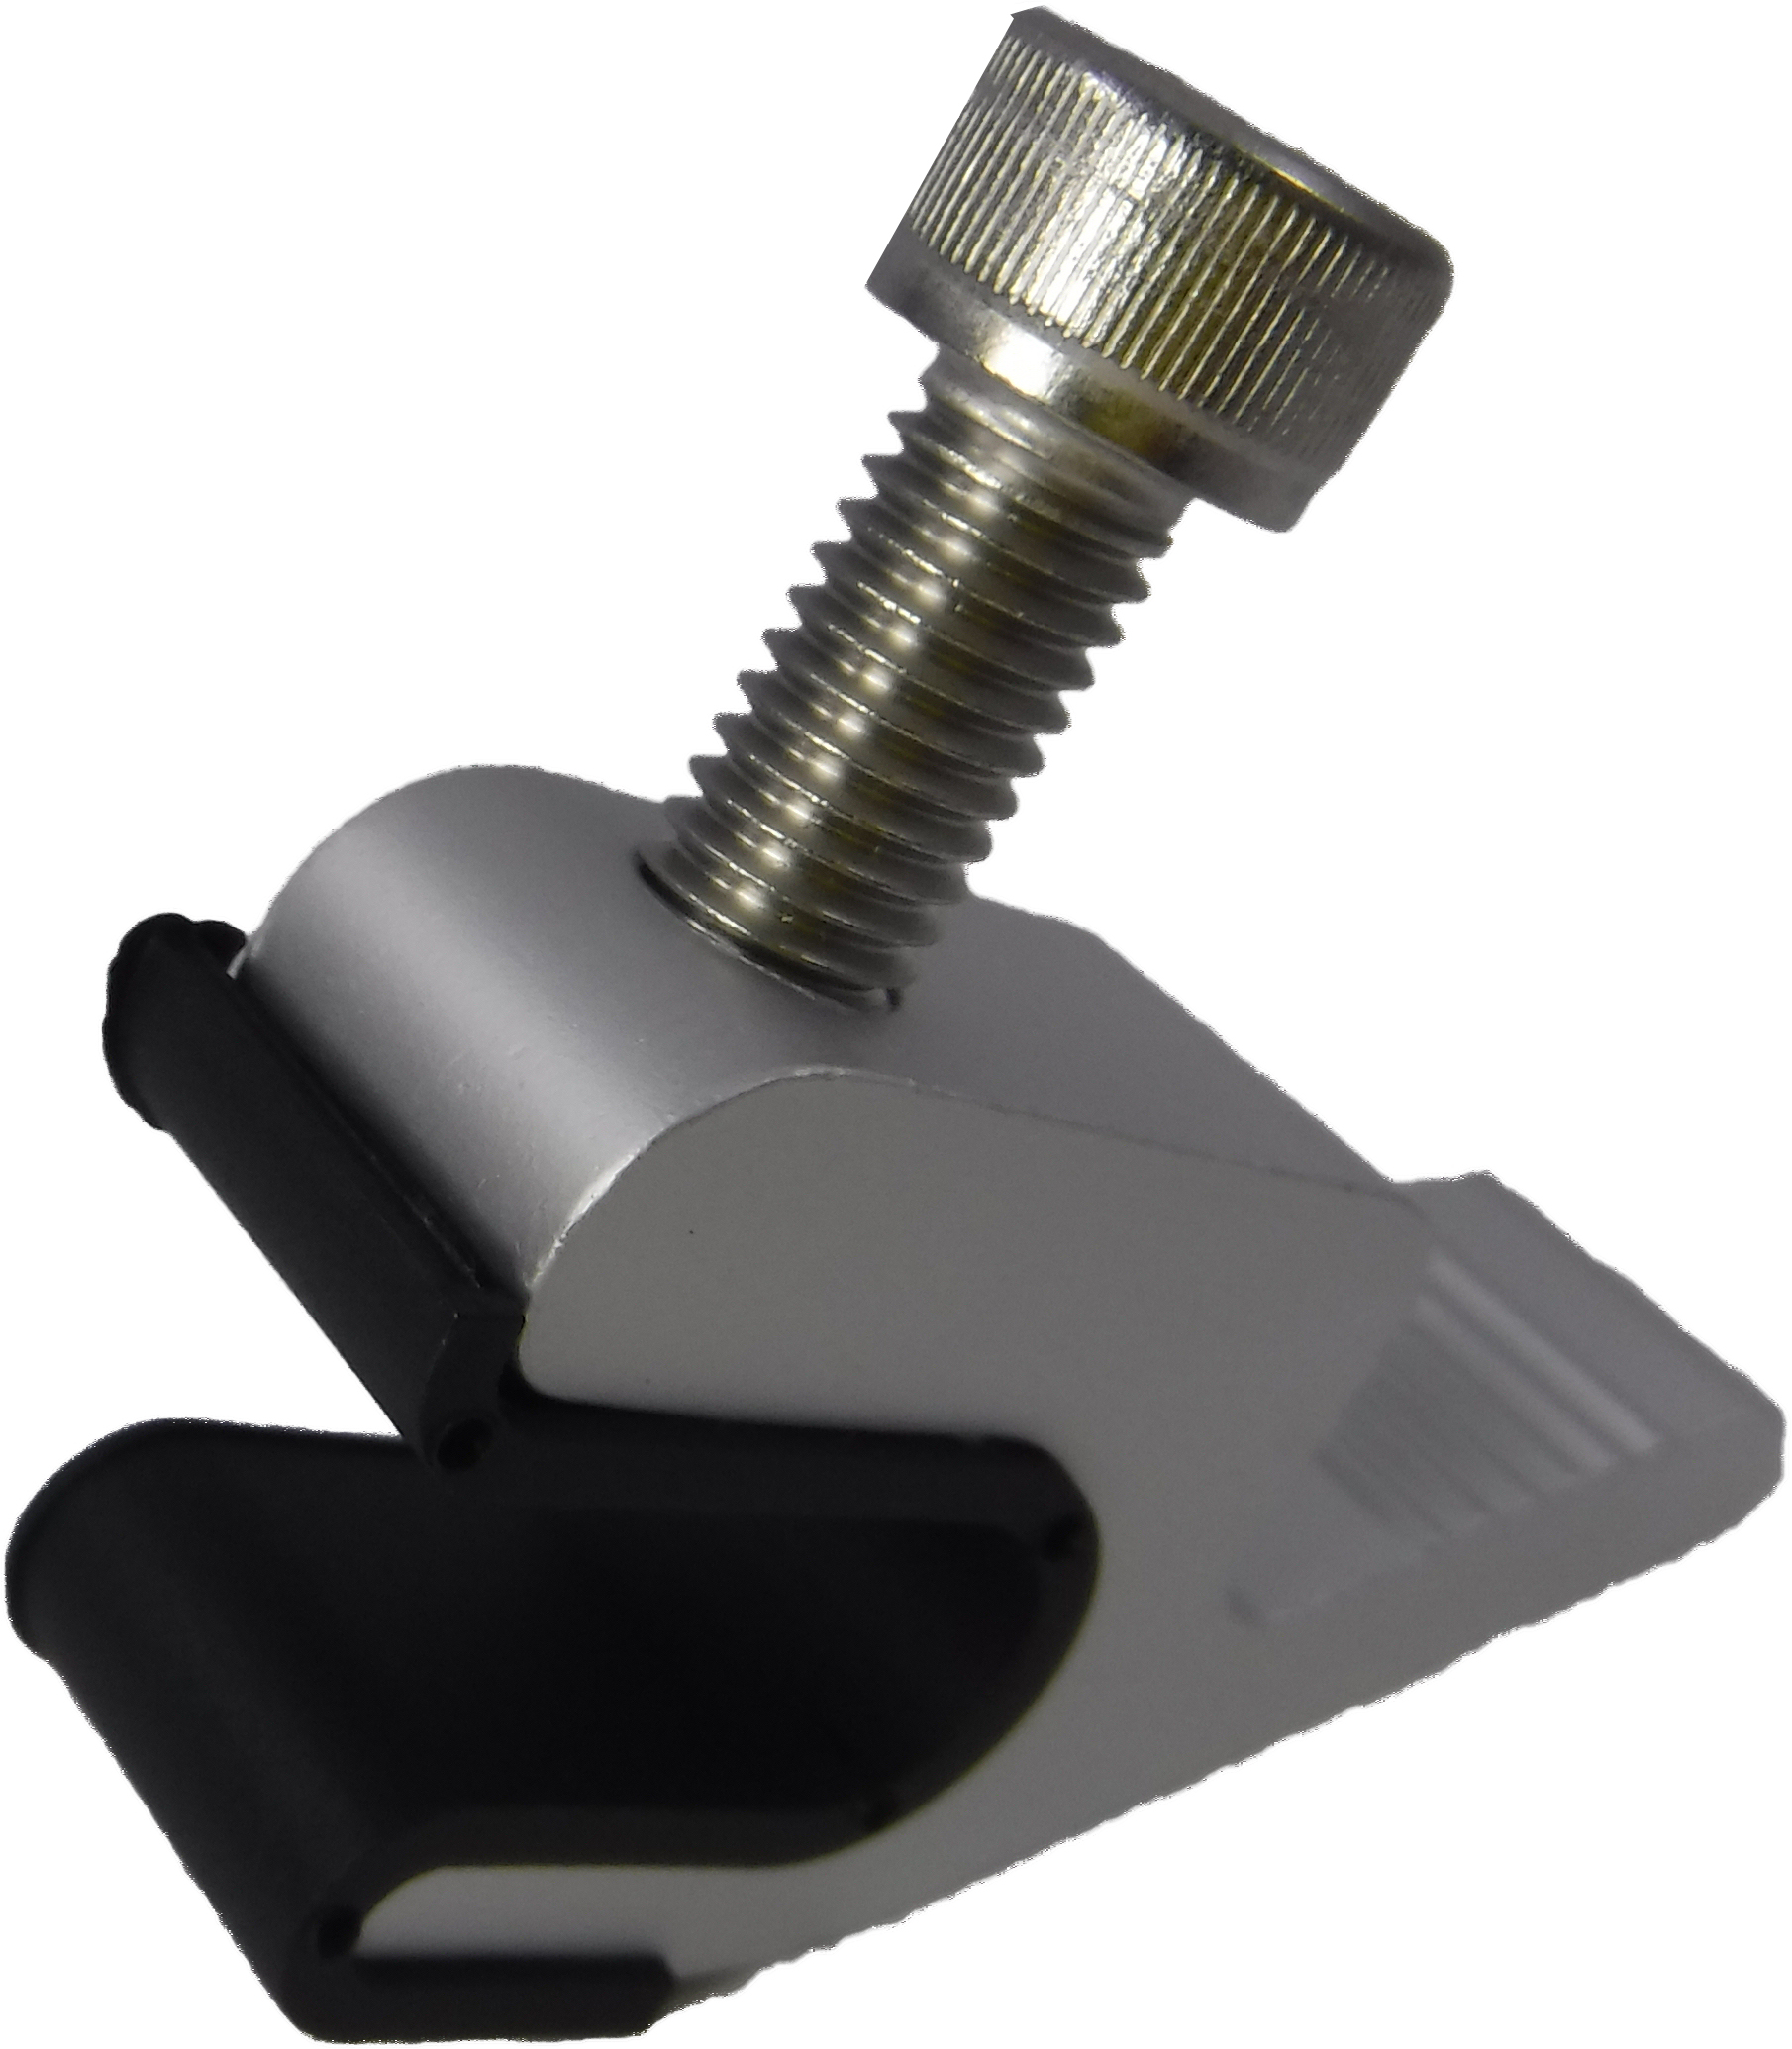 wheel-remover-1